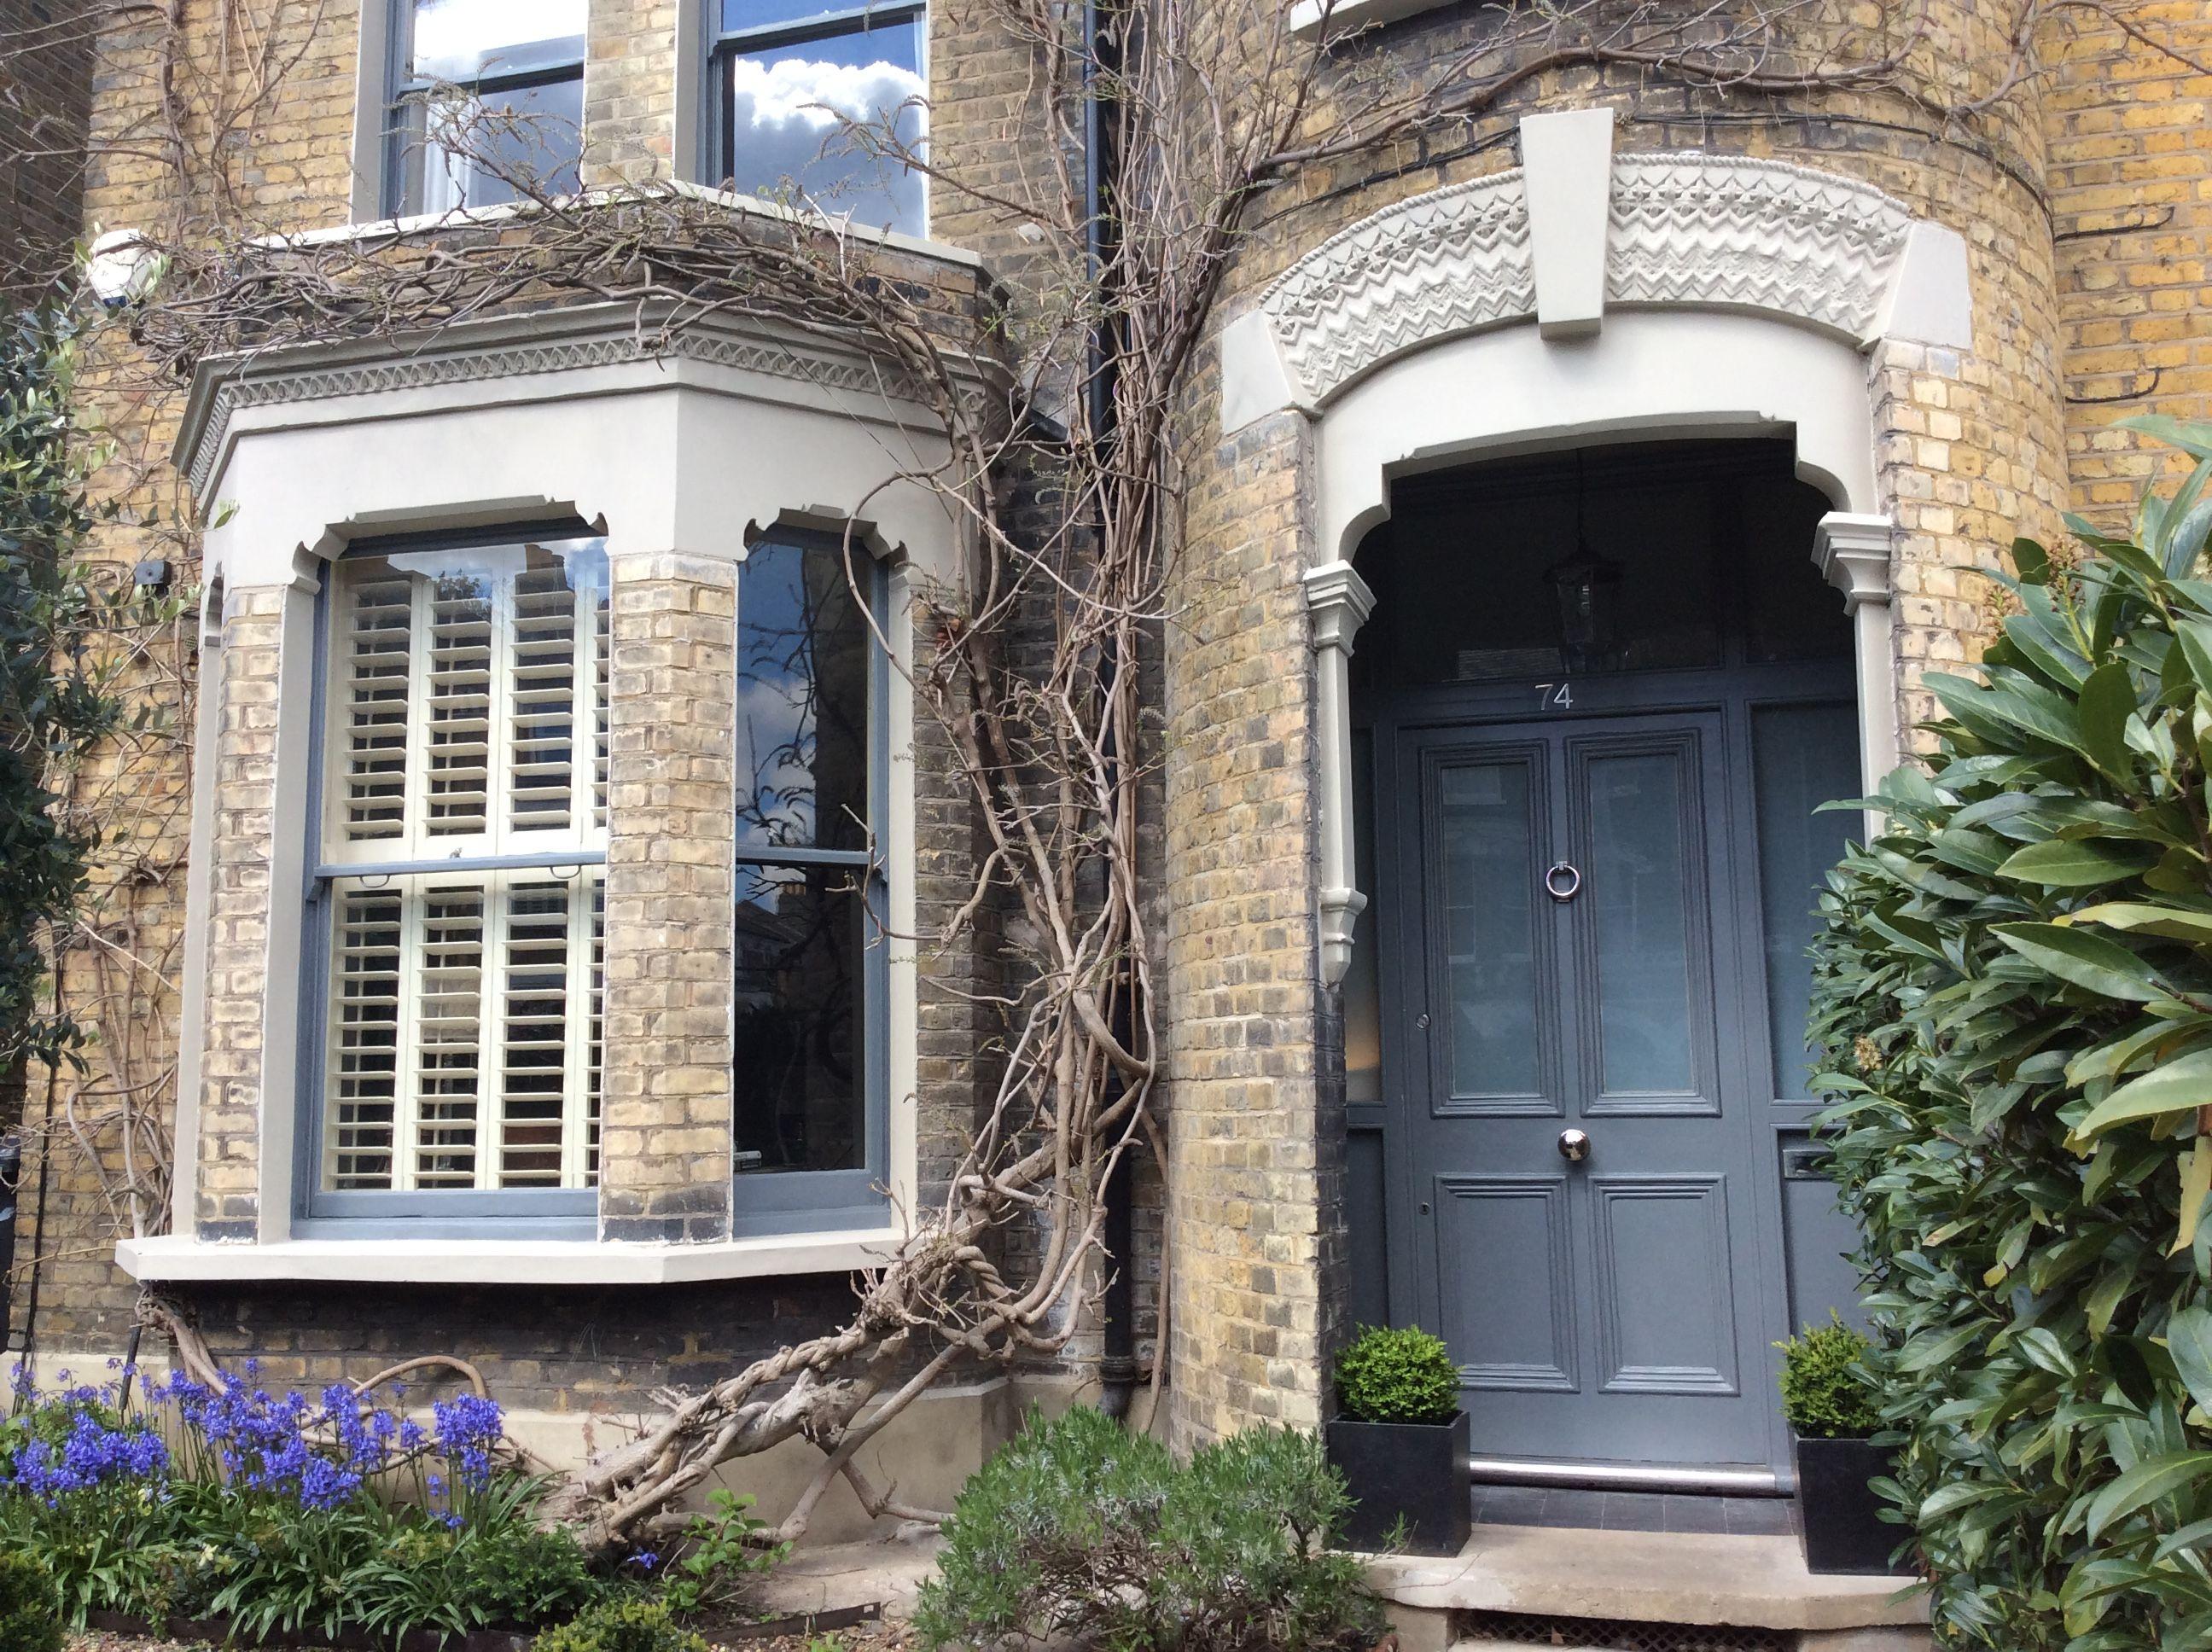 Little greene portland stone scree london victorian house front